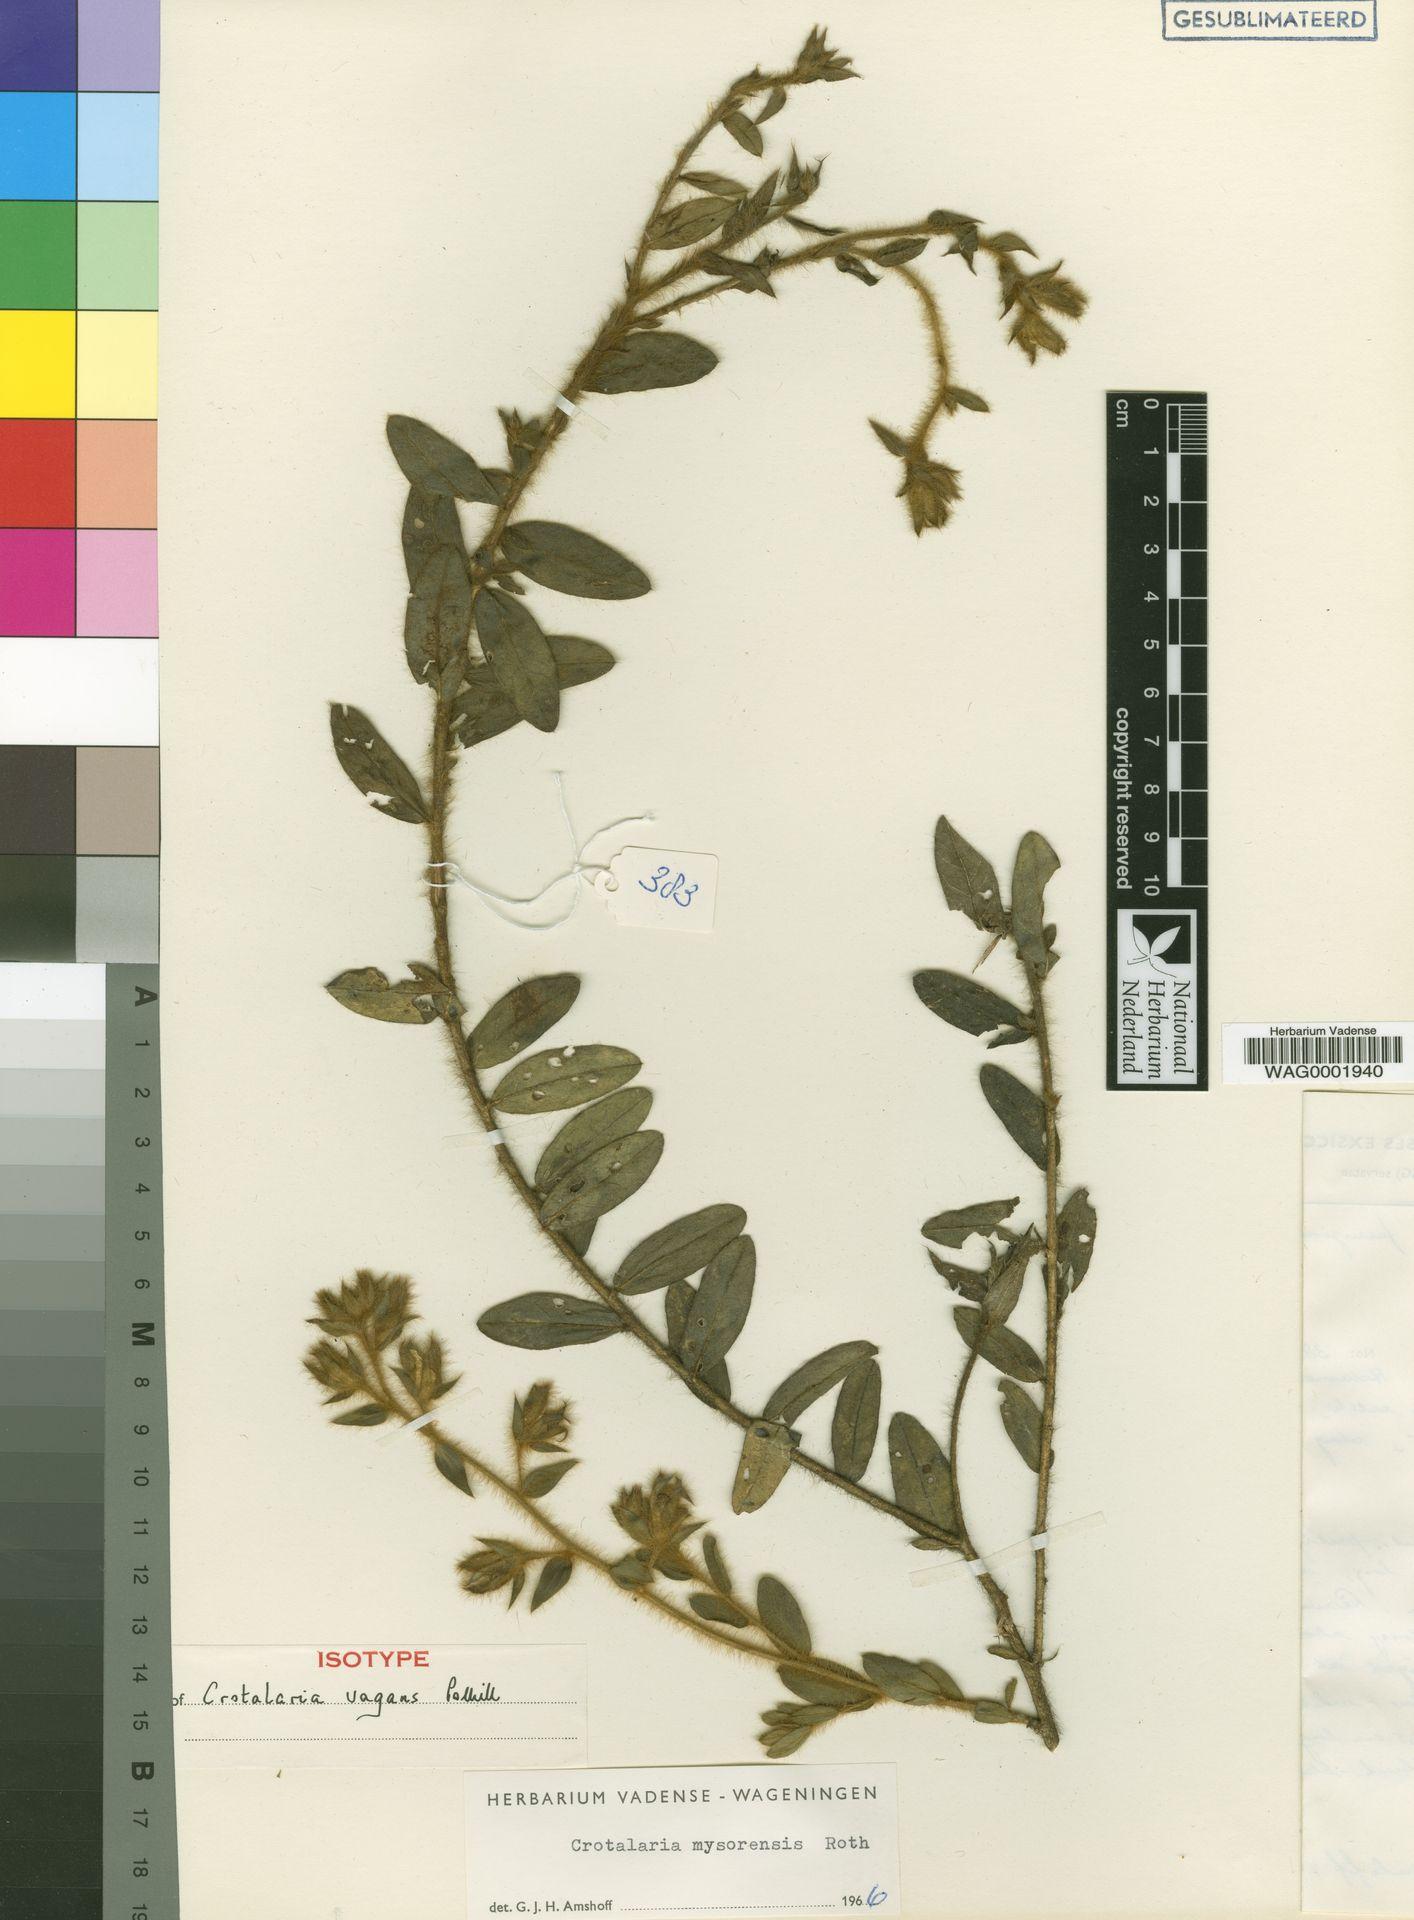 WAG0001940   Crotalaria vagans Polhill